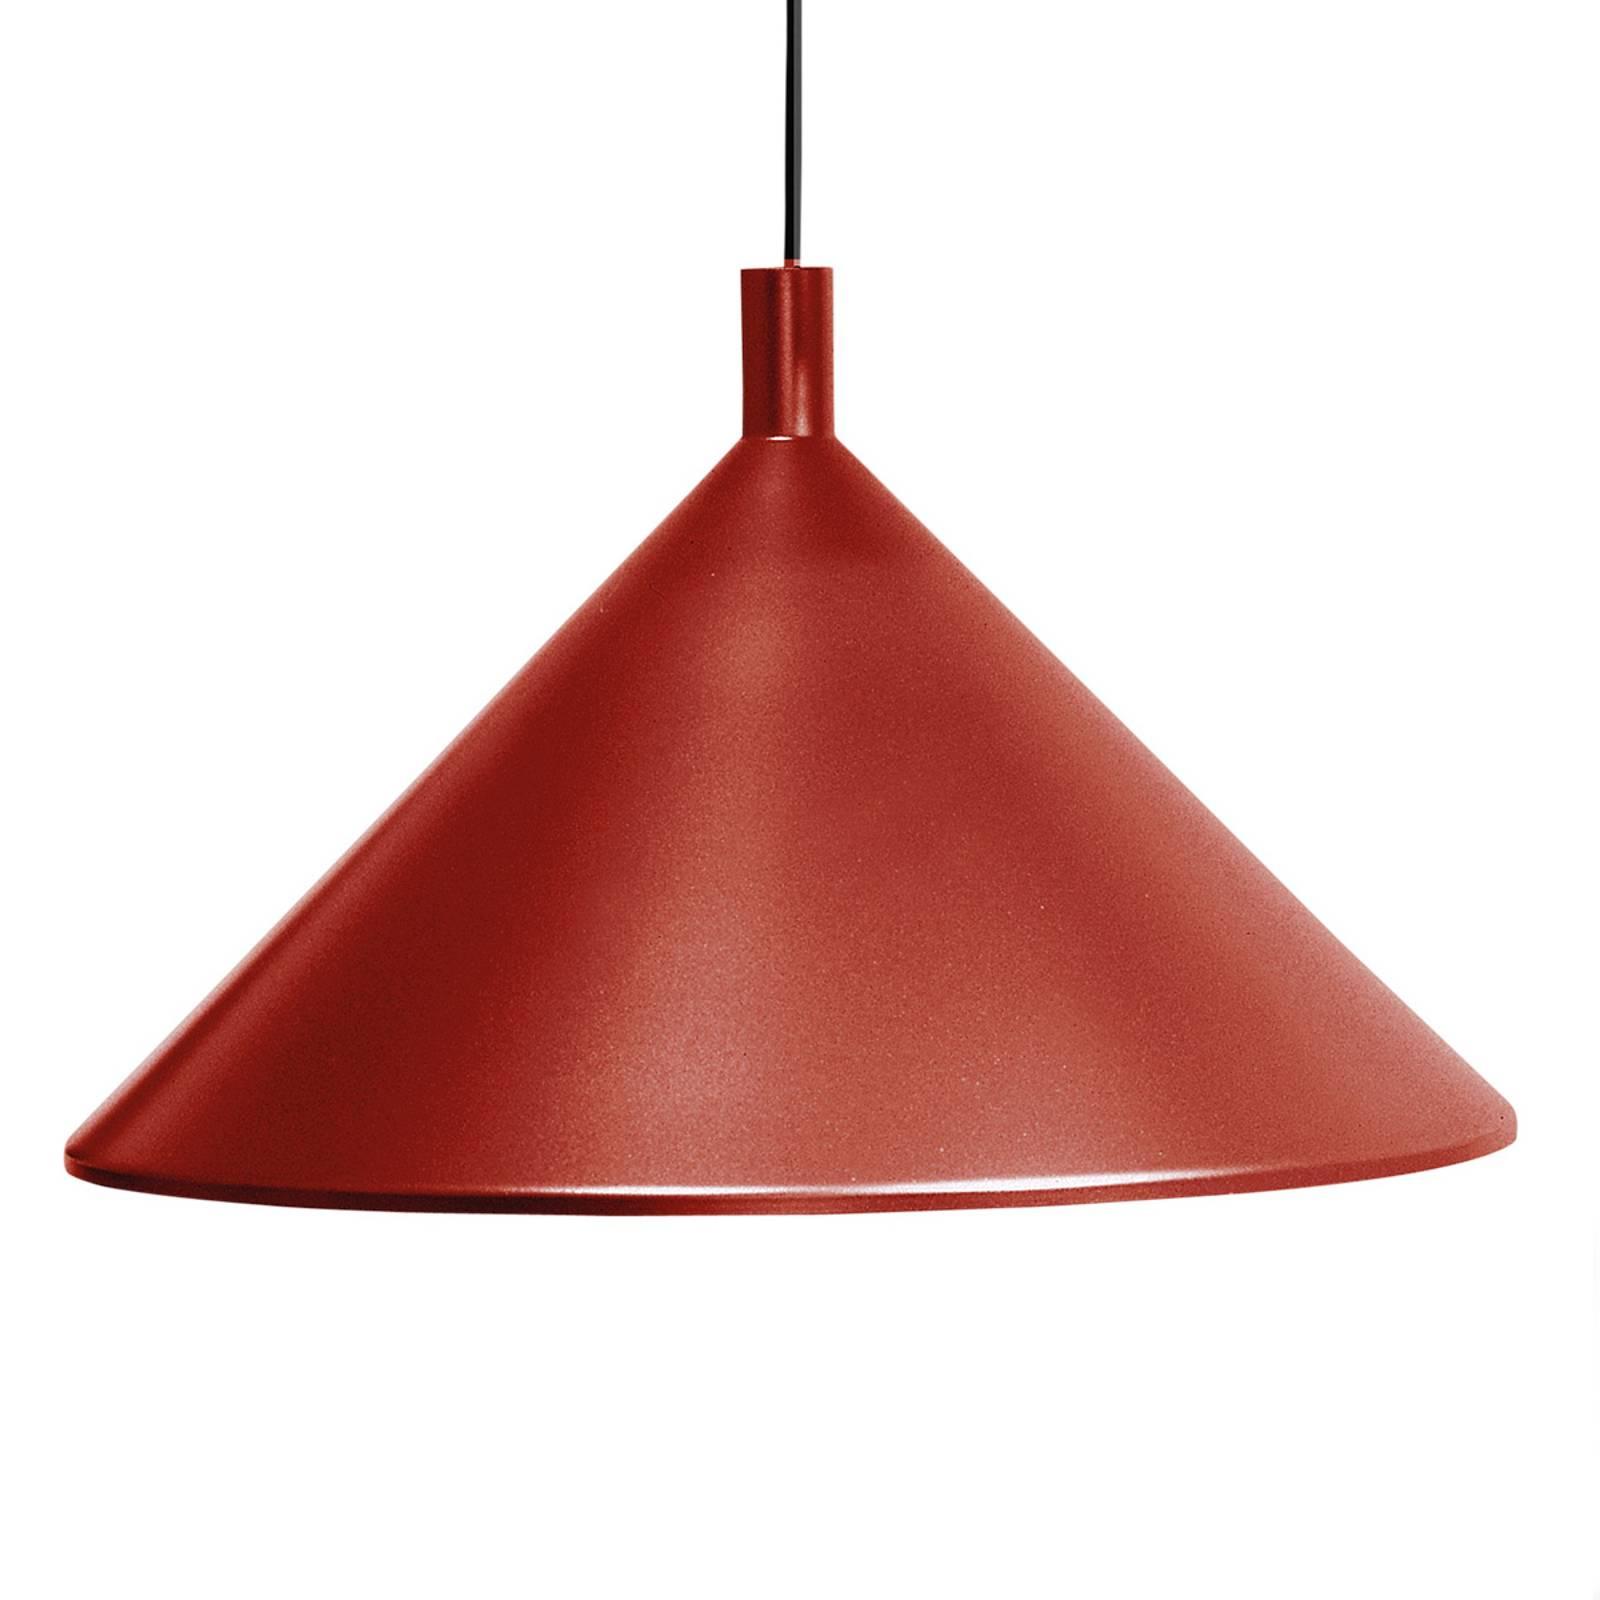 Martinelli Luce Cono hanglamp rood, Ø 45 cm